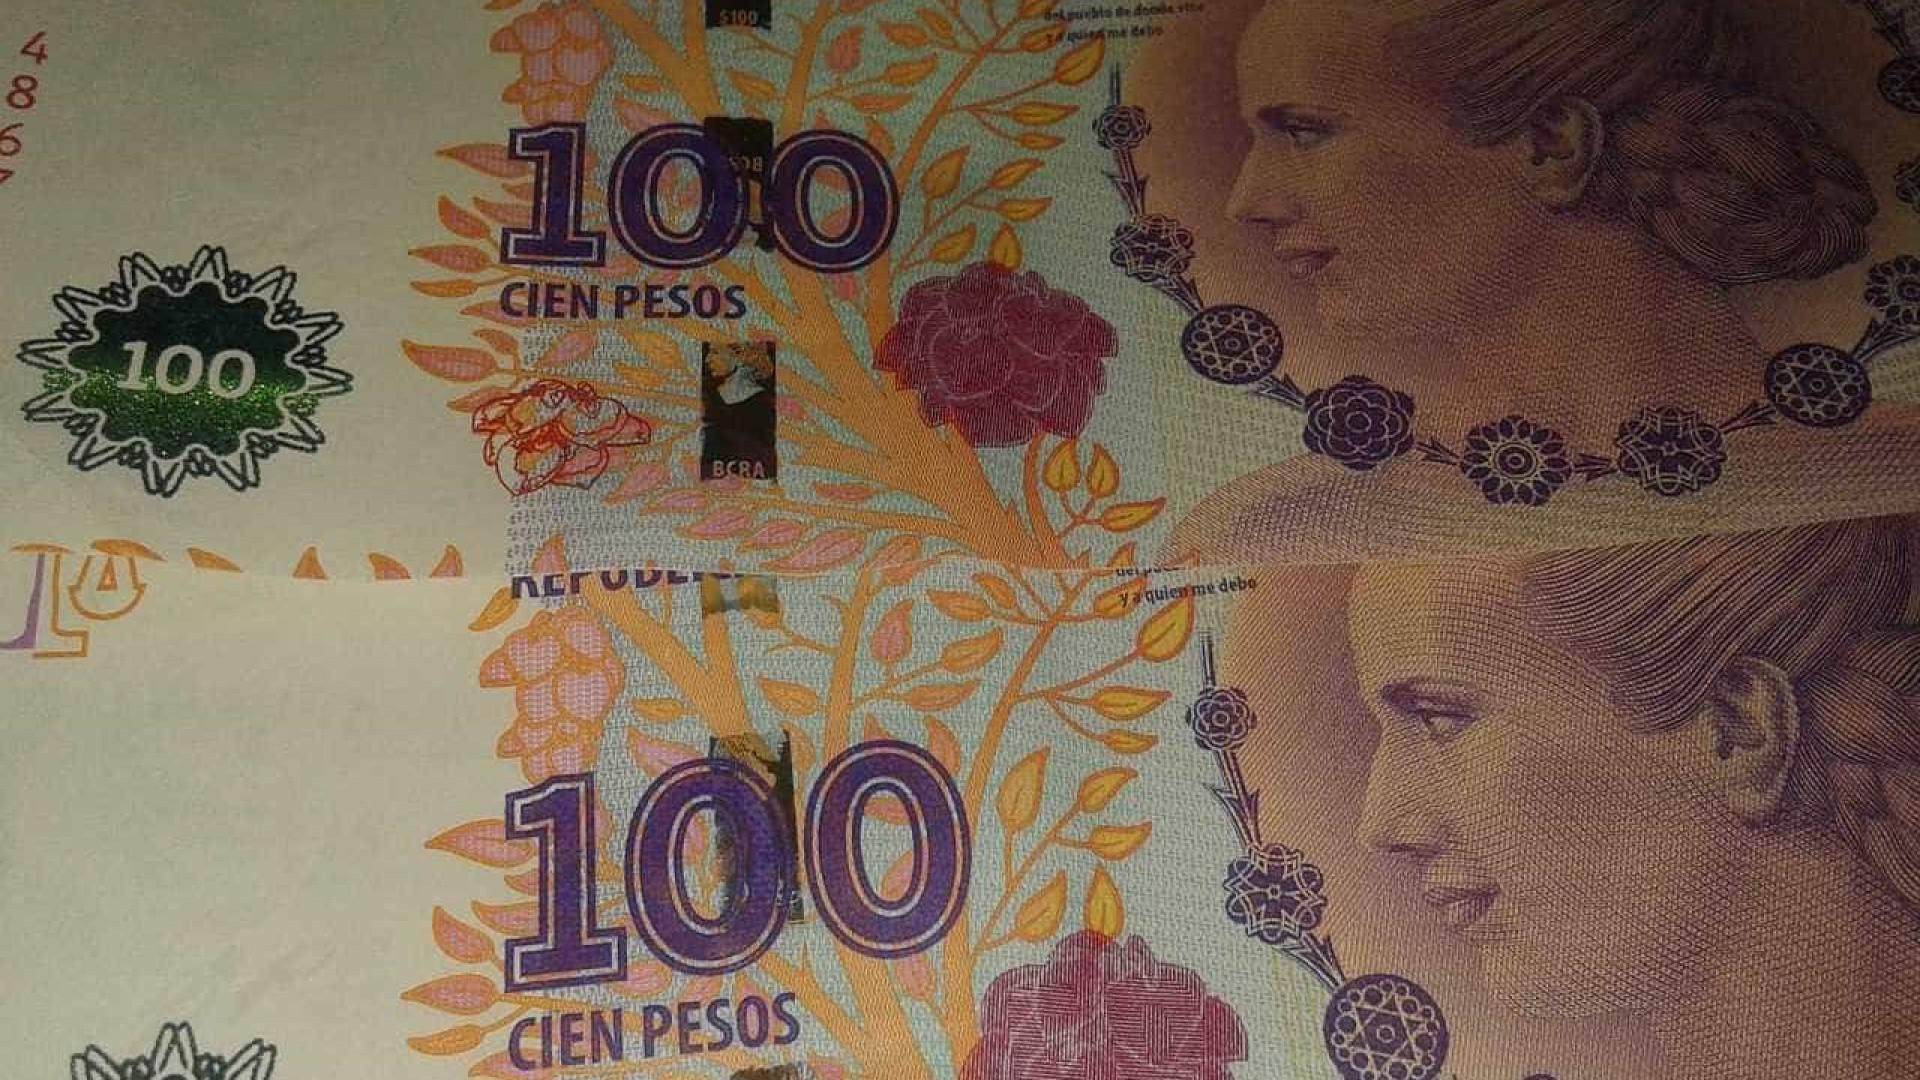 Crise argentina pode afetar países vizinhos, diz FMI